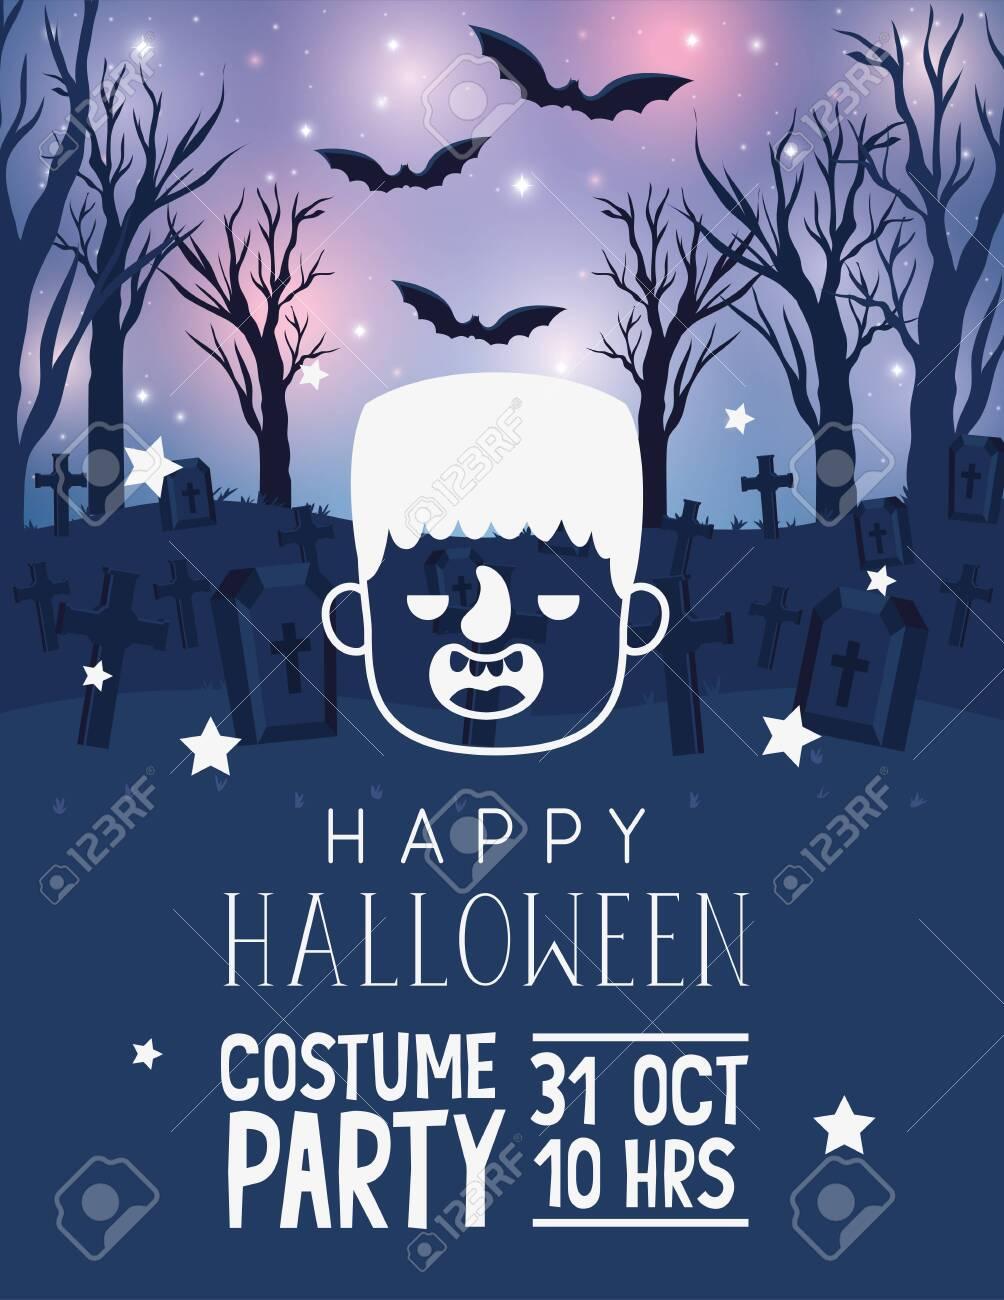 Happy halloween card with cartoon frankenstein head over graveyard glowing background with bats, vector illustration - 132615119